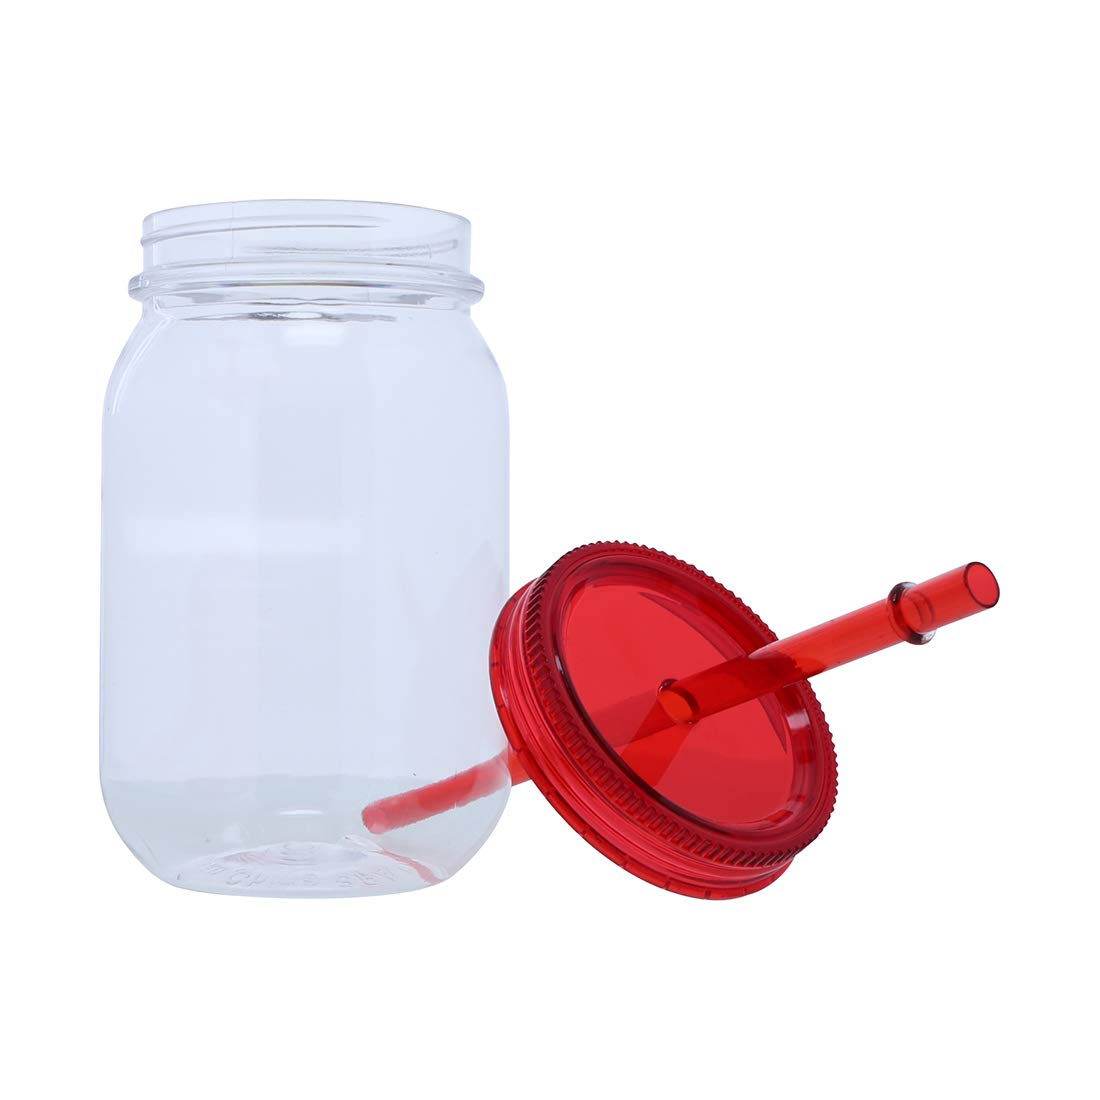 Plastic Retro Look Mason Jar With Straw Set of 2-Mix